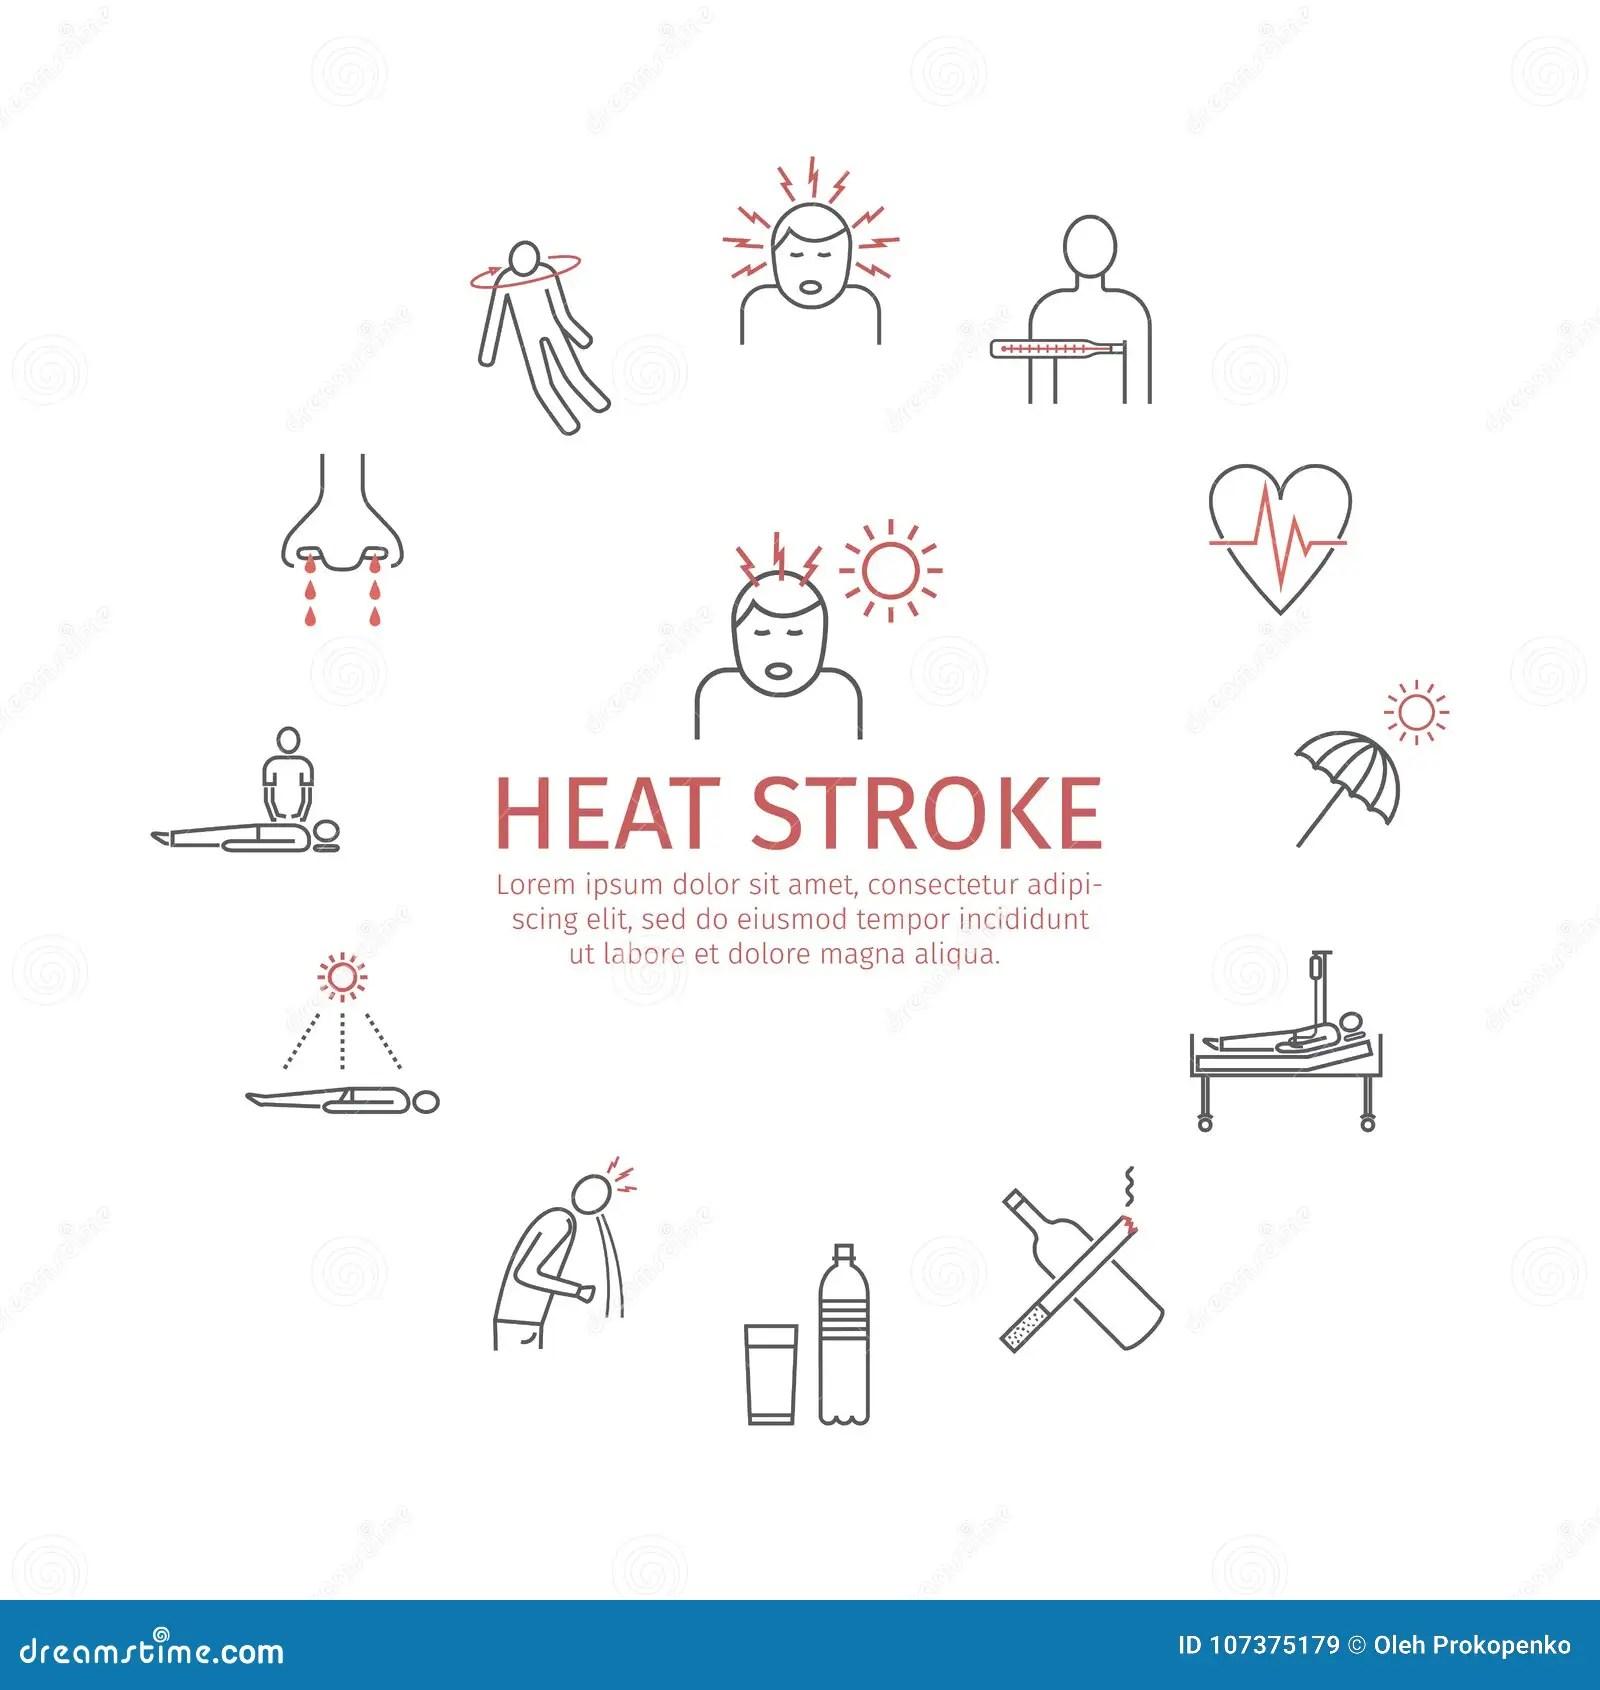 Heat stroke vector icons stock vector. Illustration of